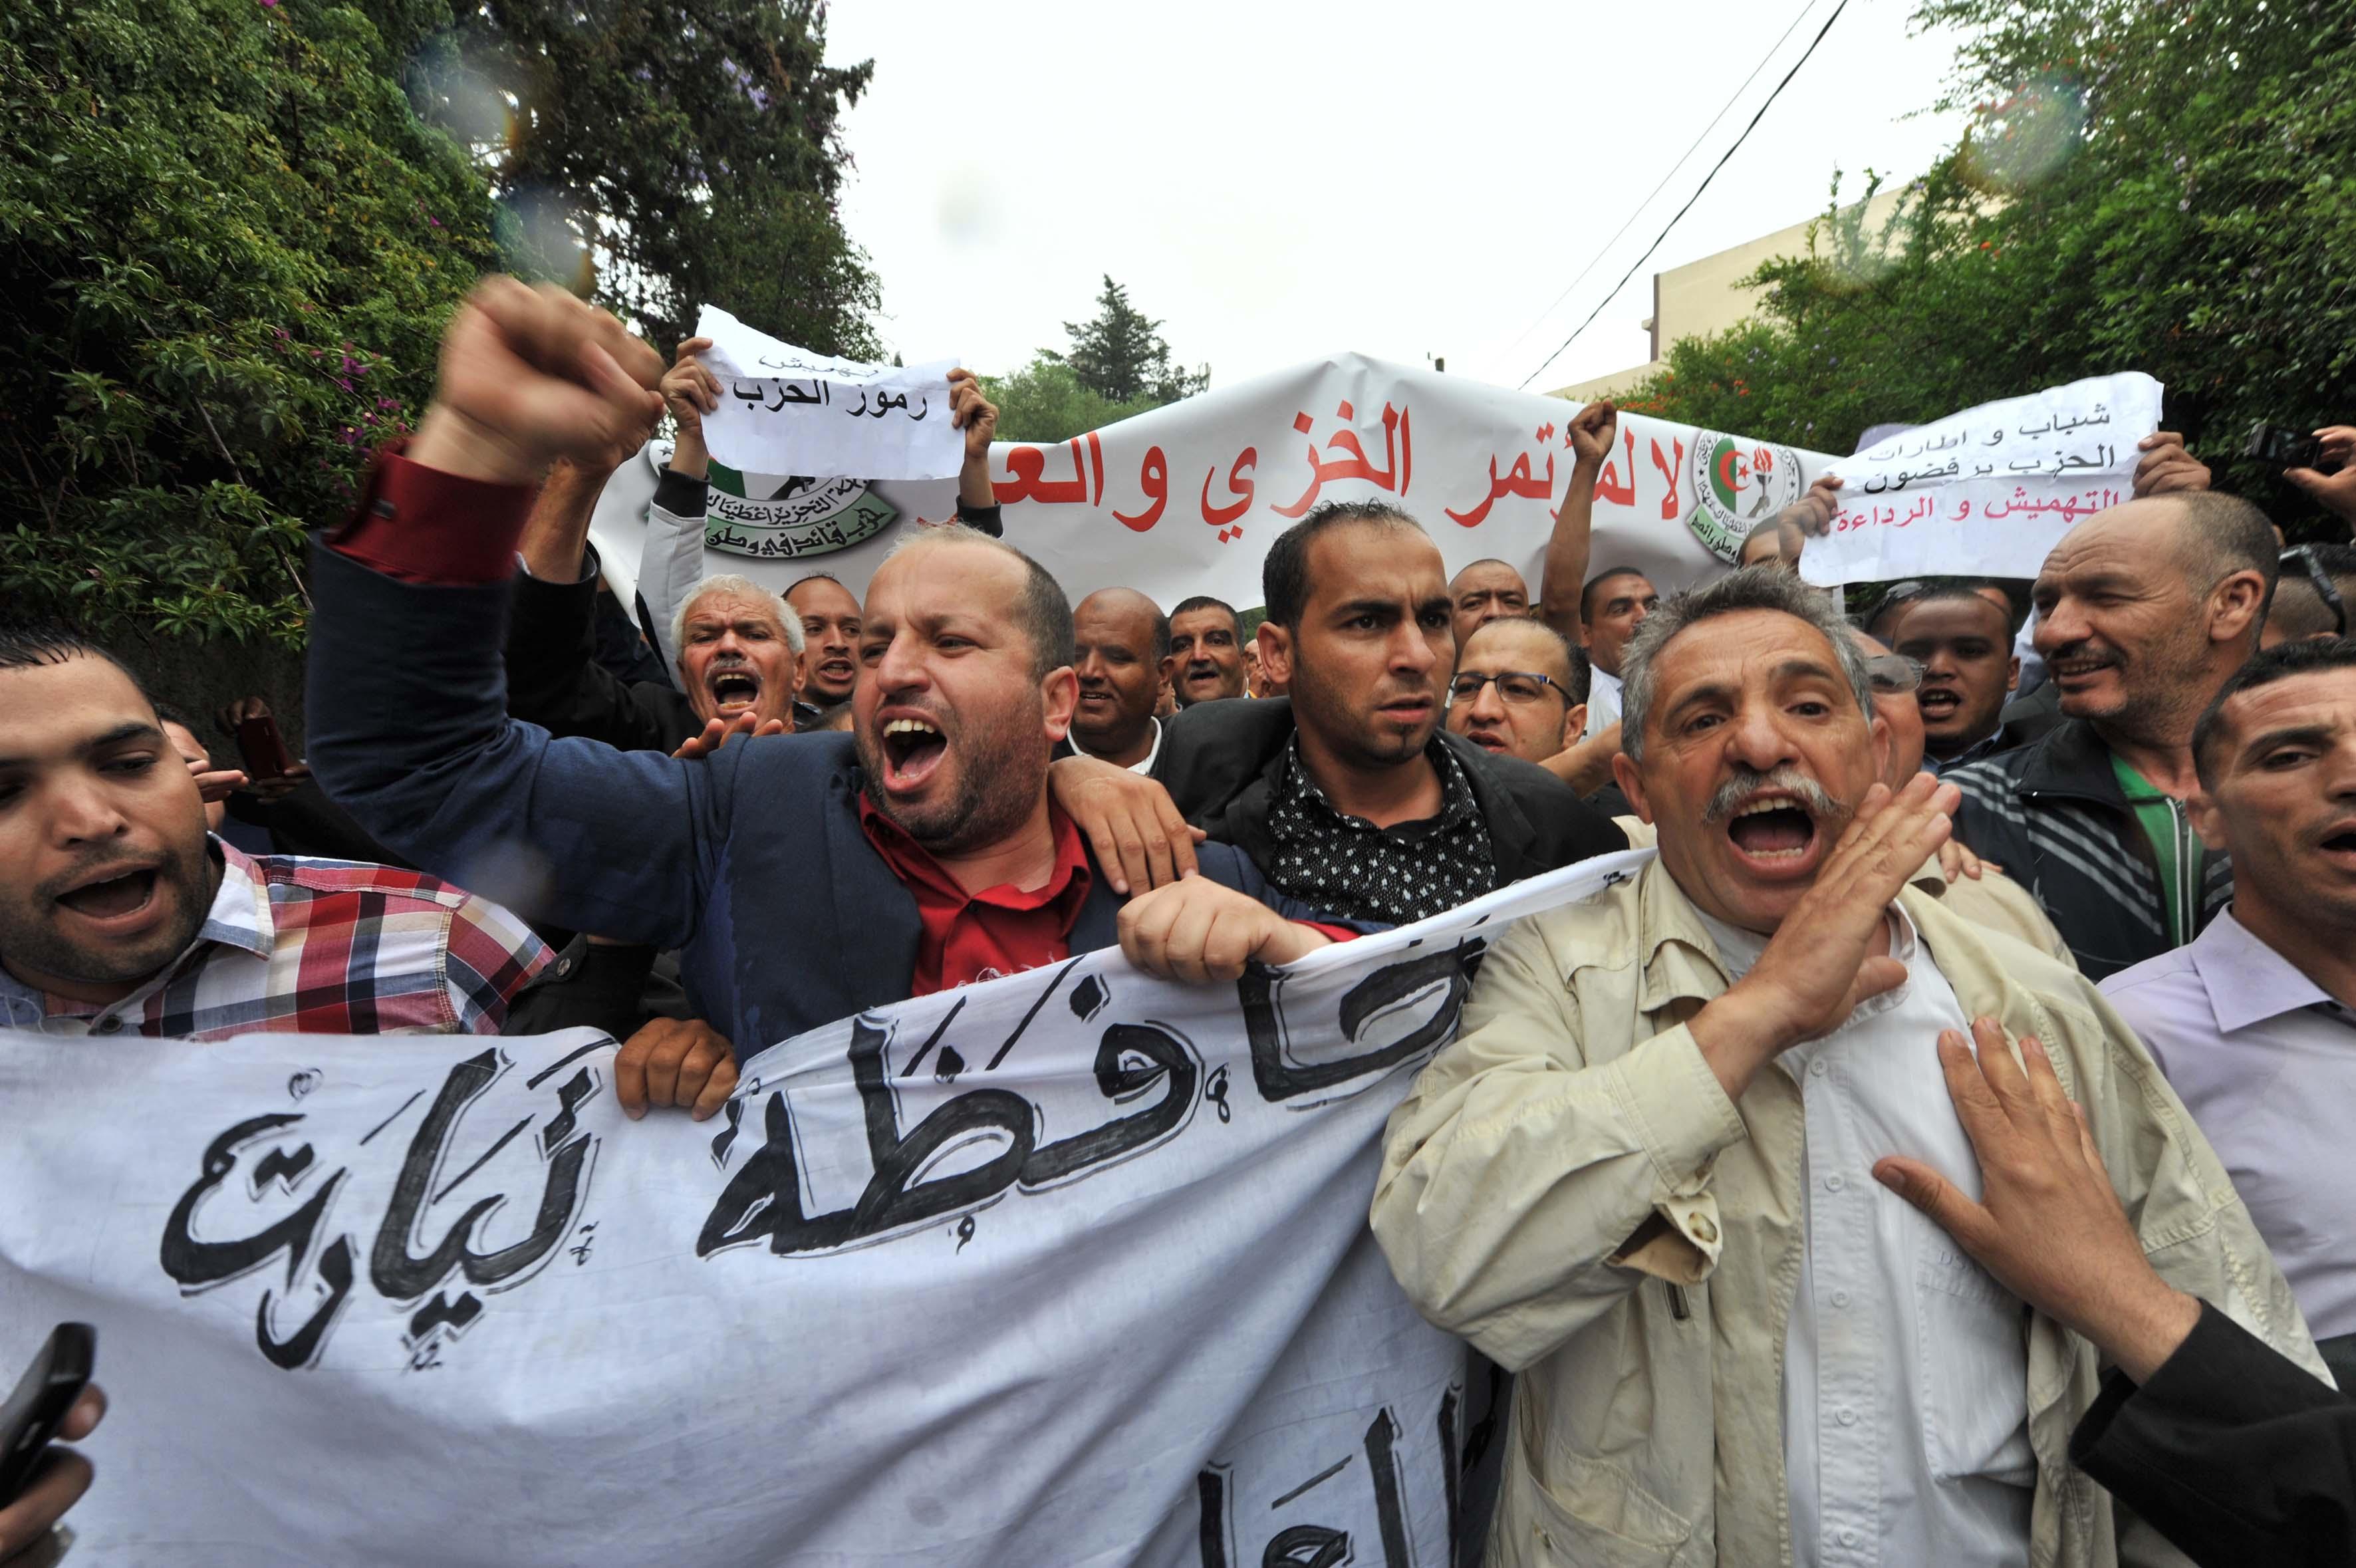 Des représentants de la mouhafadha FLN de Tiaret lors d'un sit-in en mai 2015. New Press